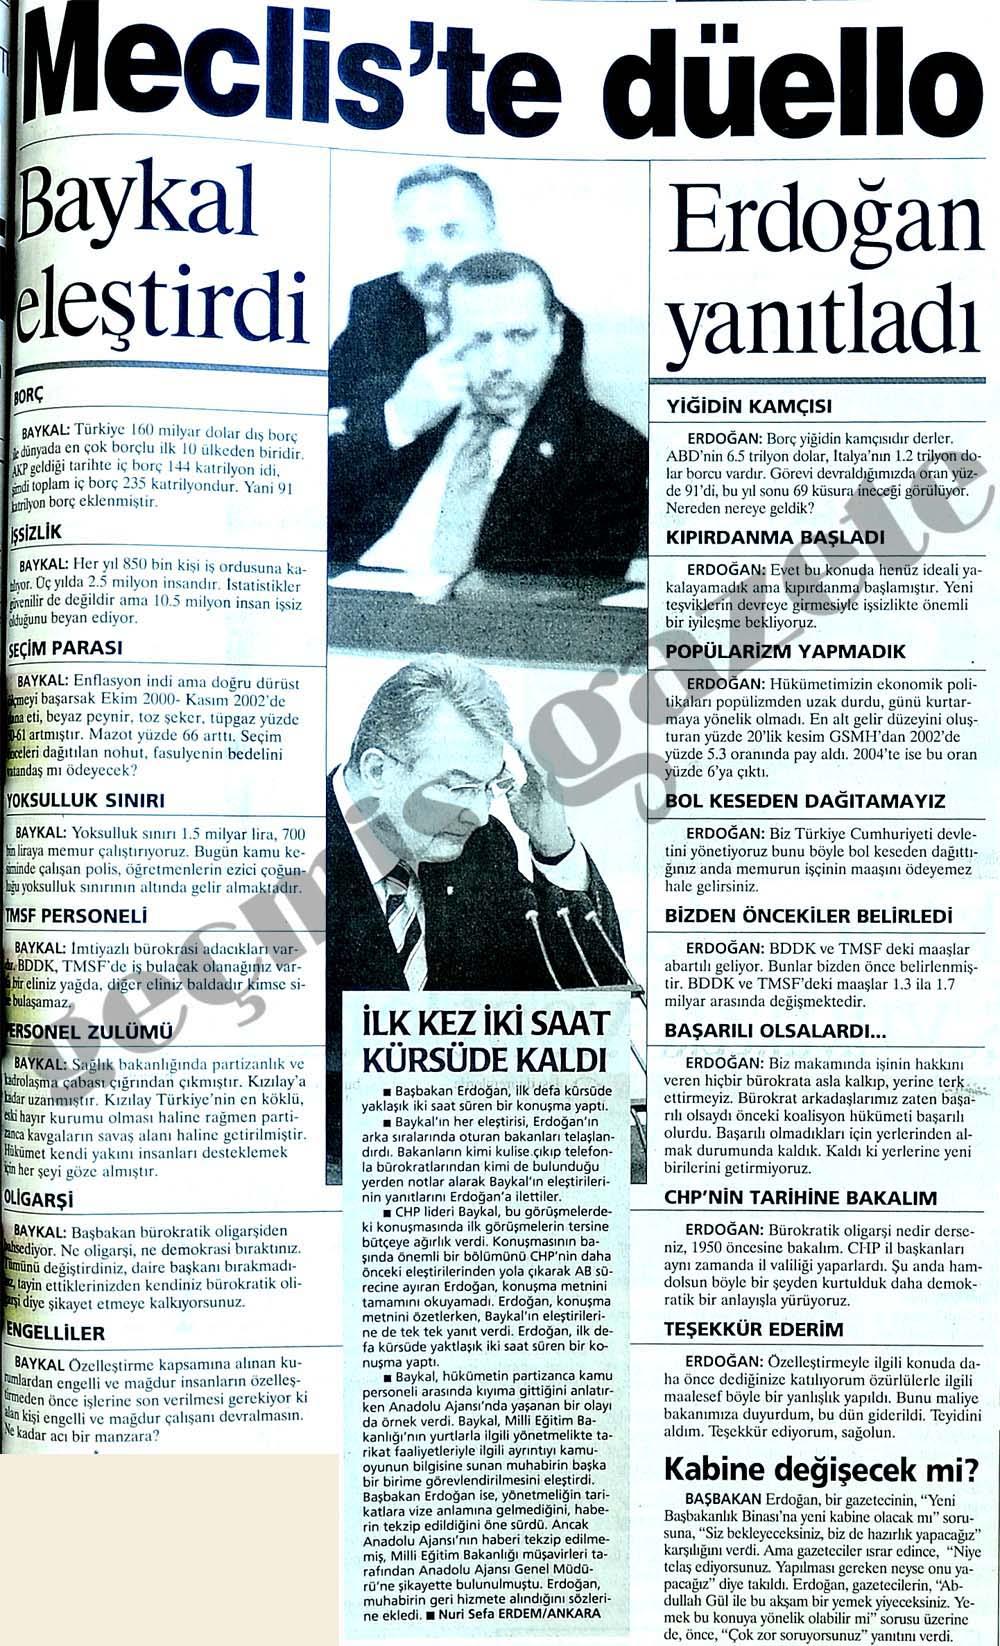 Erdoğan durdurdu